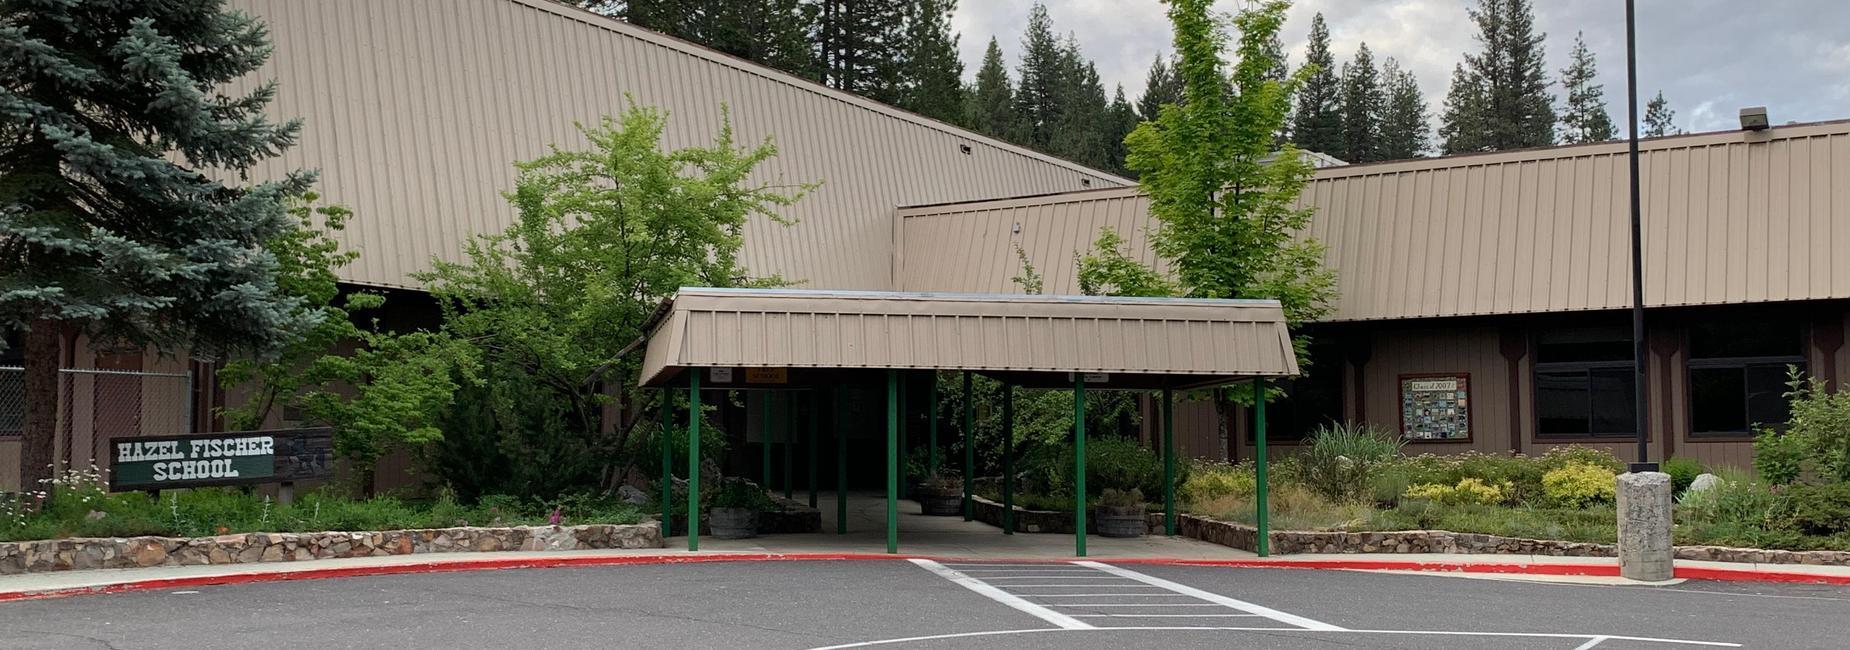 Hazel Fischer Elementary